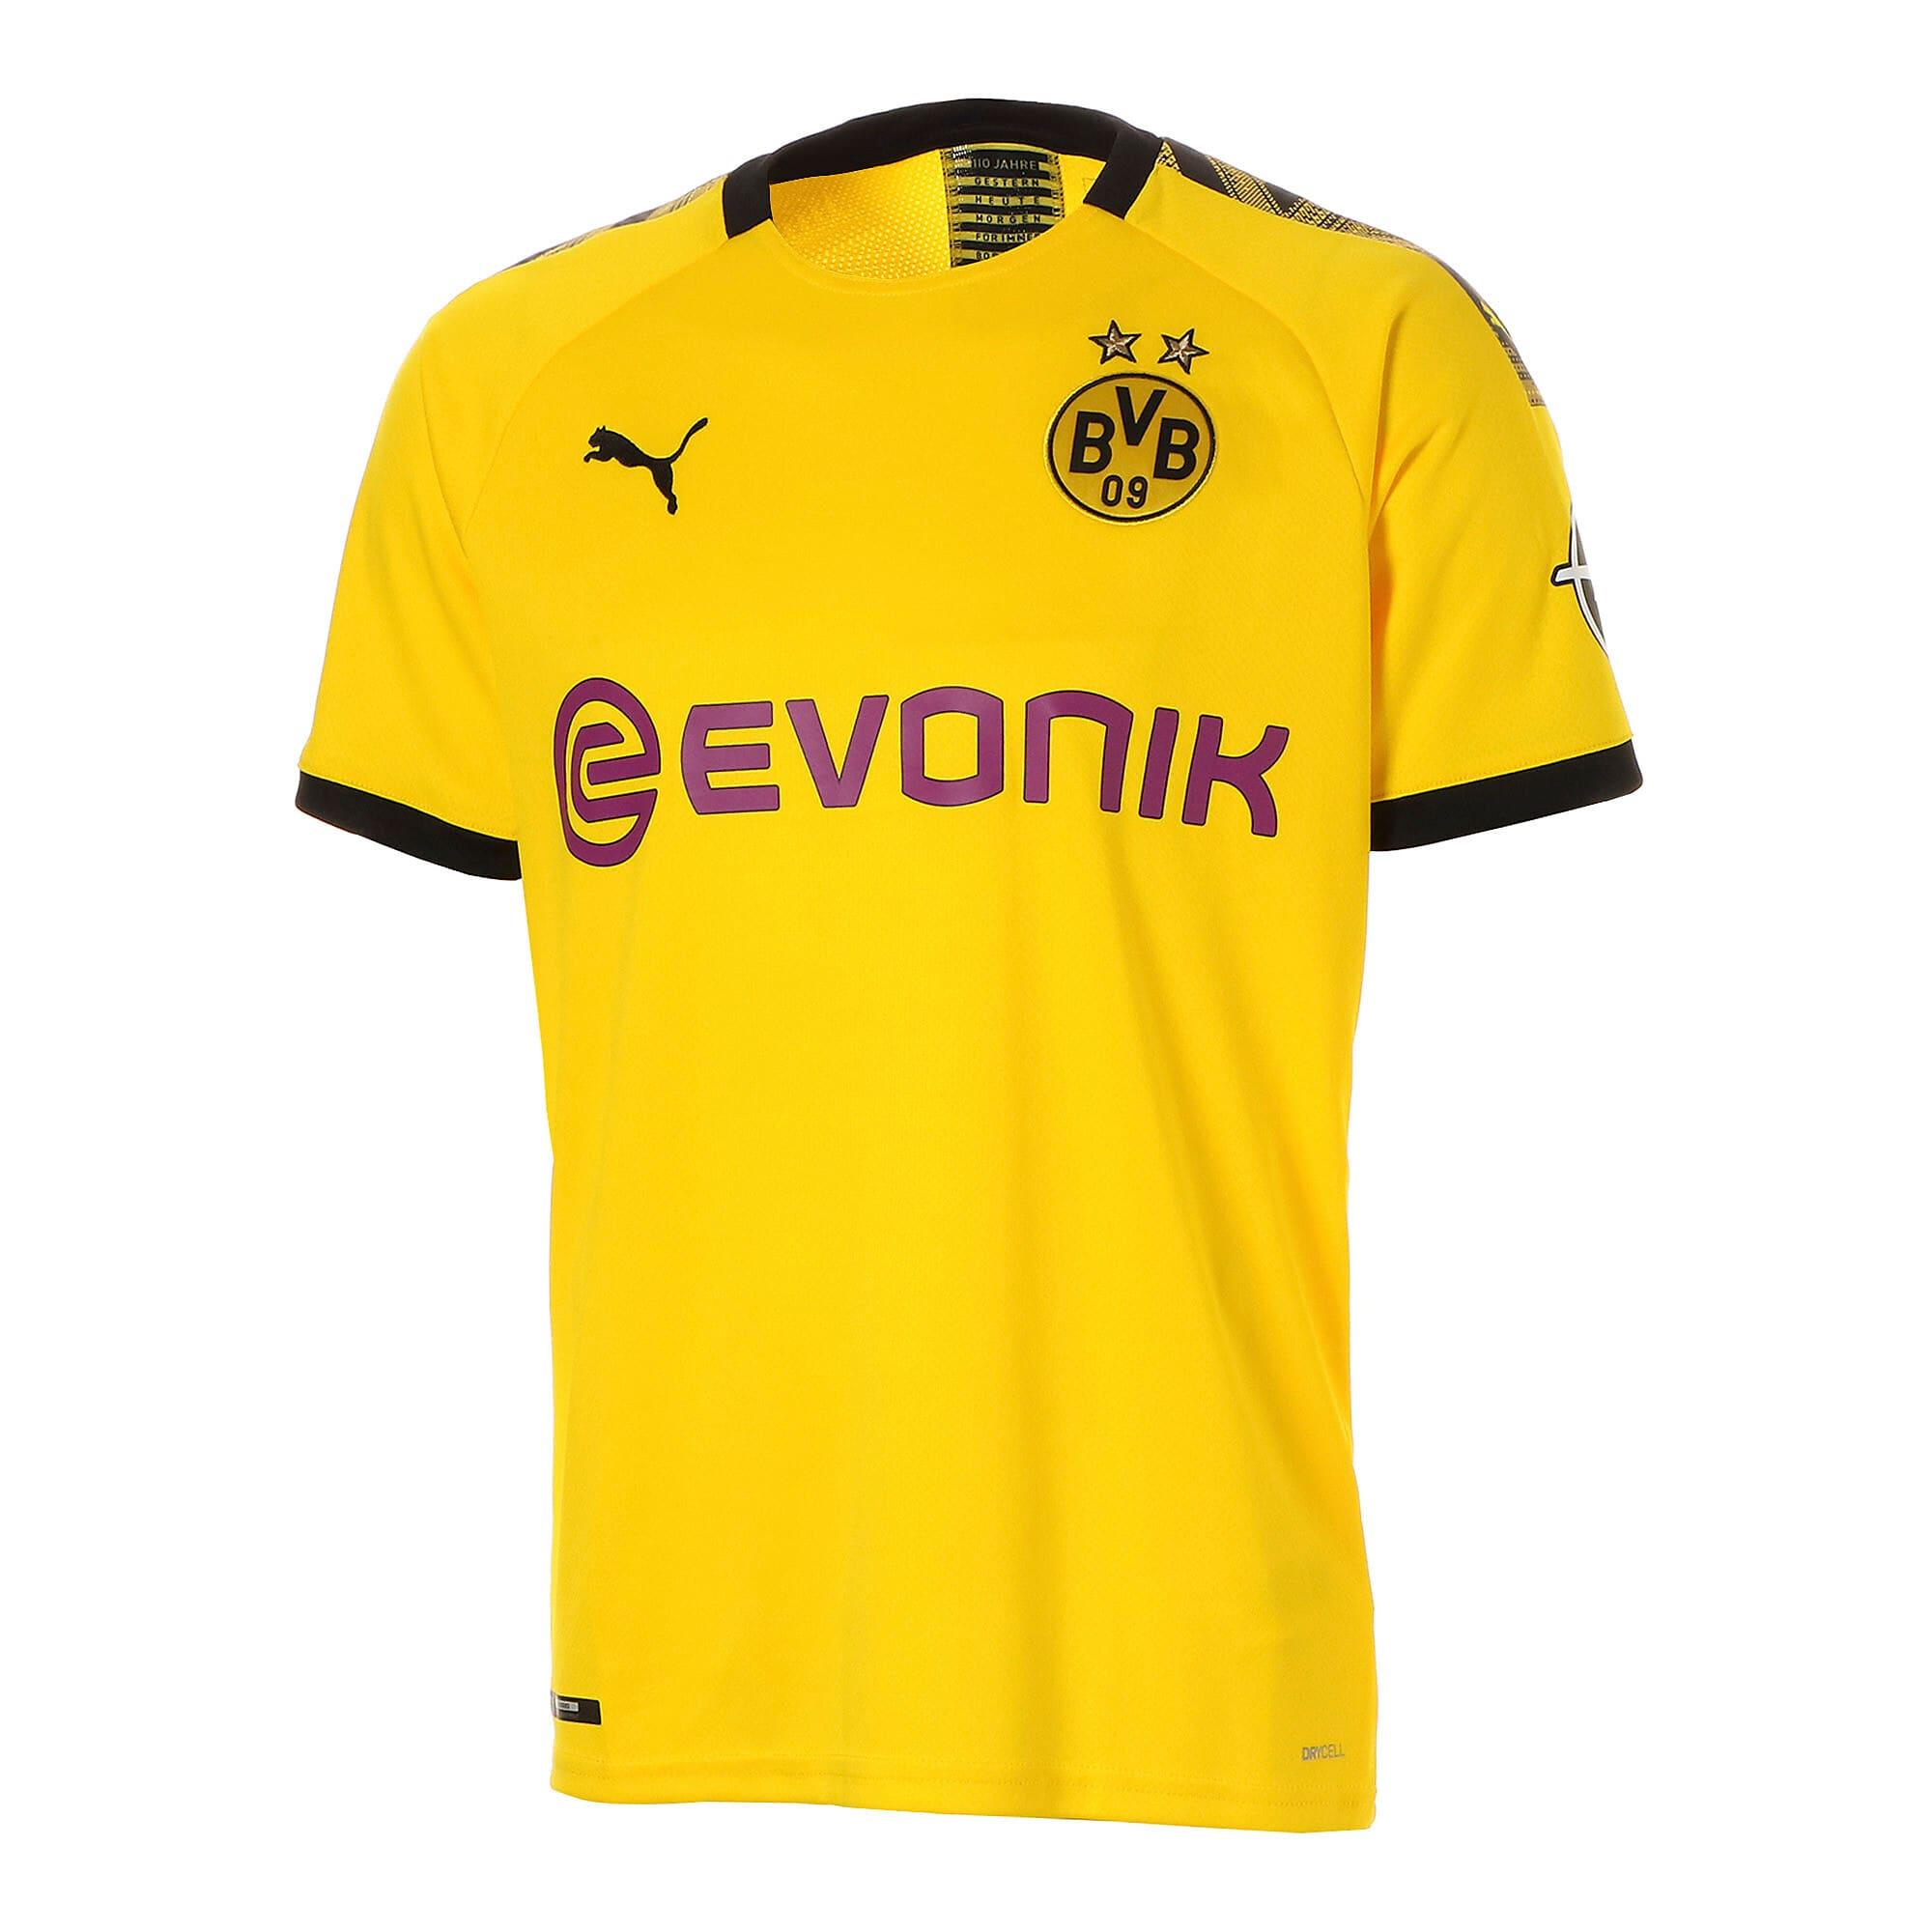 Thumbnail 1 of ドルトムント BVB SS ホーム レプリカシャツ 半袖, Cyber Yellow-Puma Black, medium-JPN